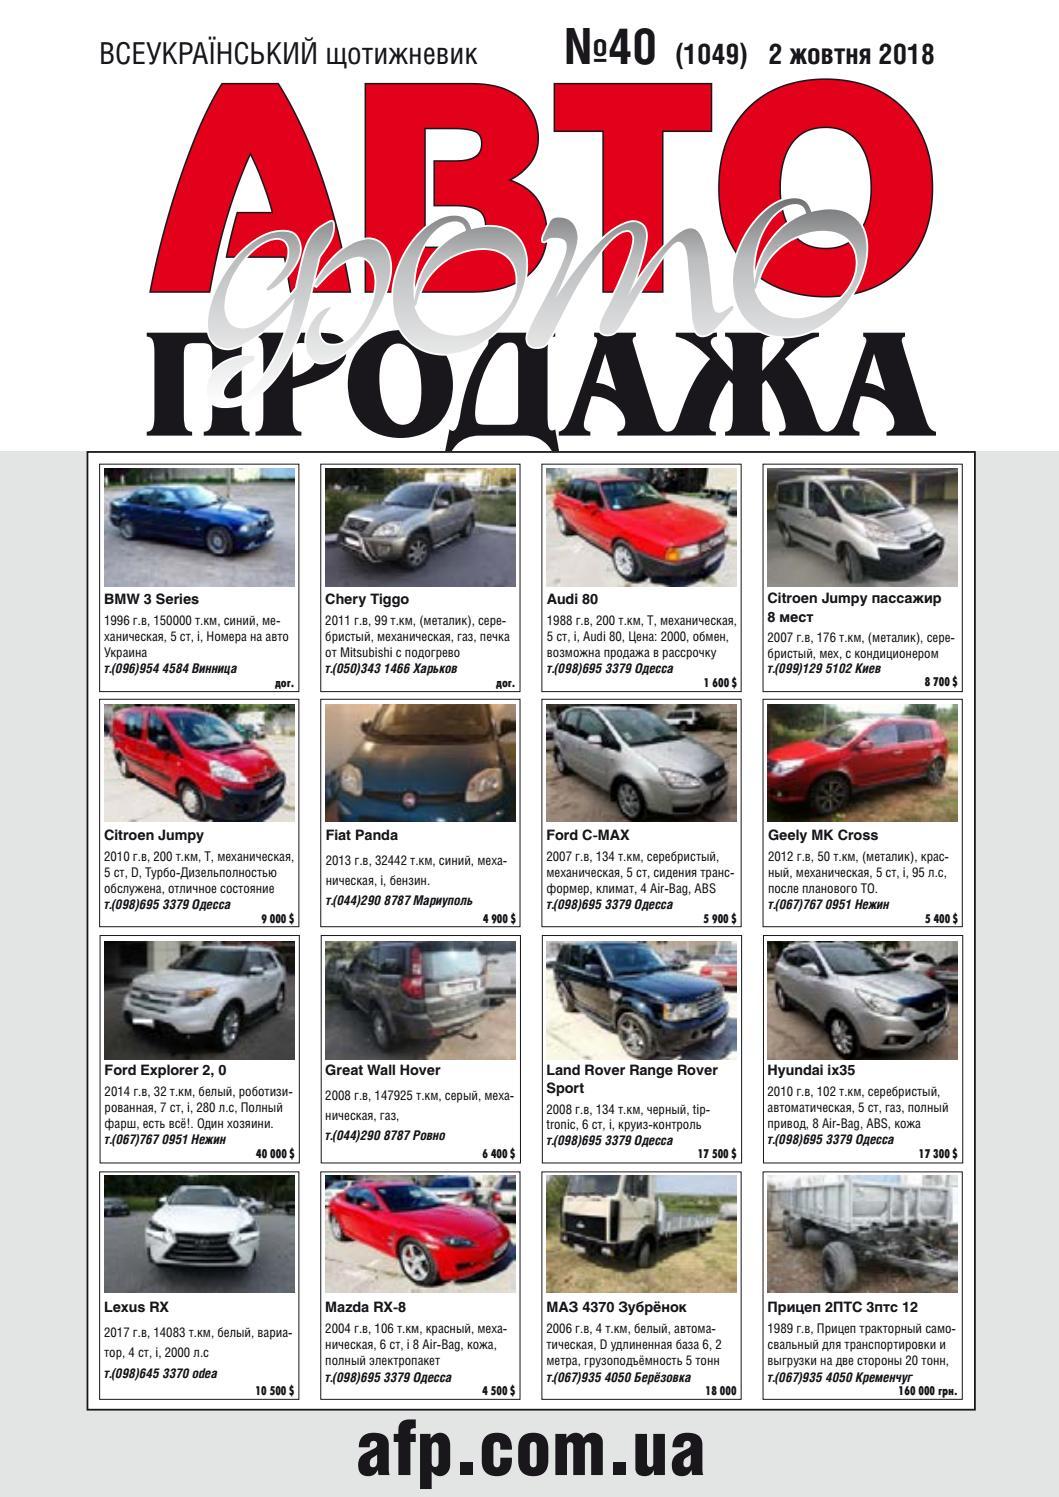 0e71c119b4d9 АвтоФотоПродажа №40 2018 by AFP - issuu